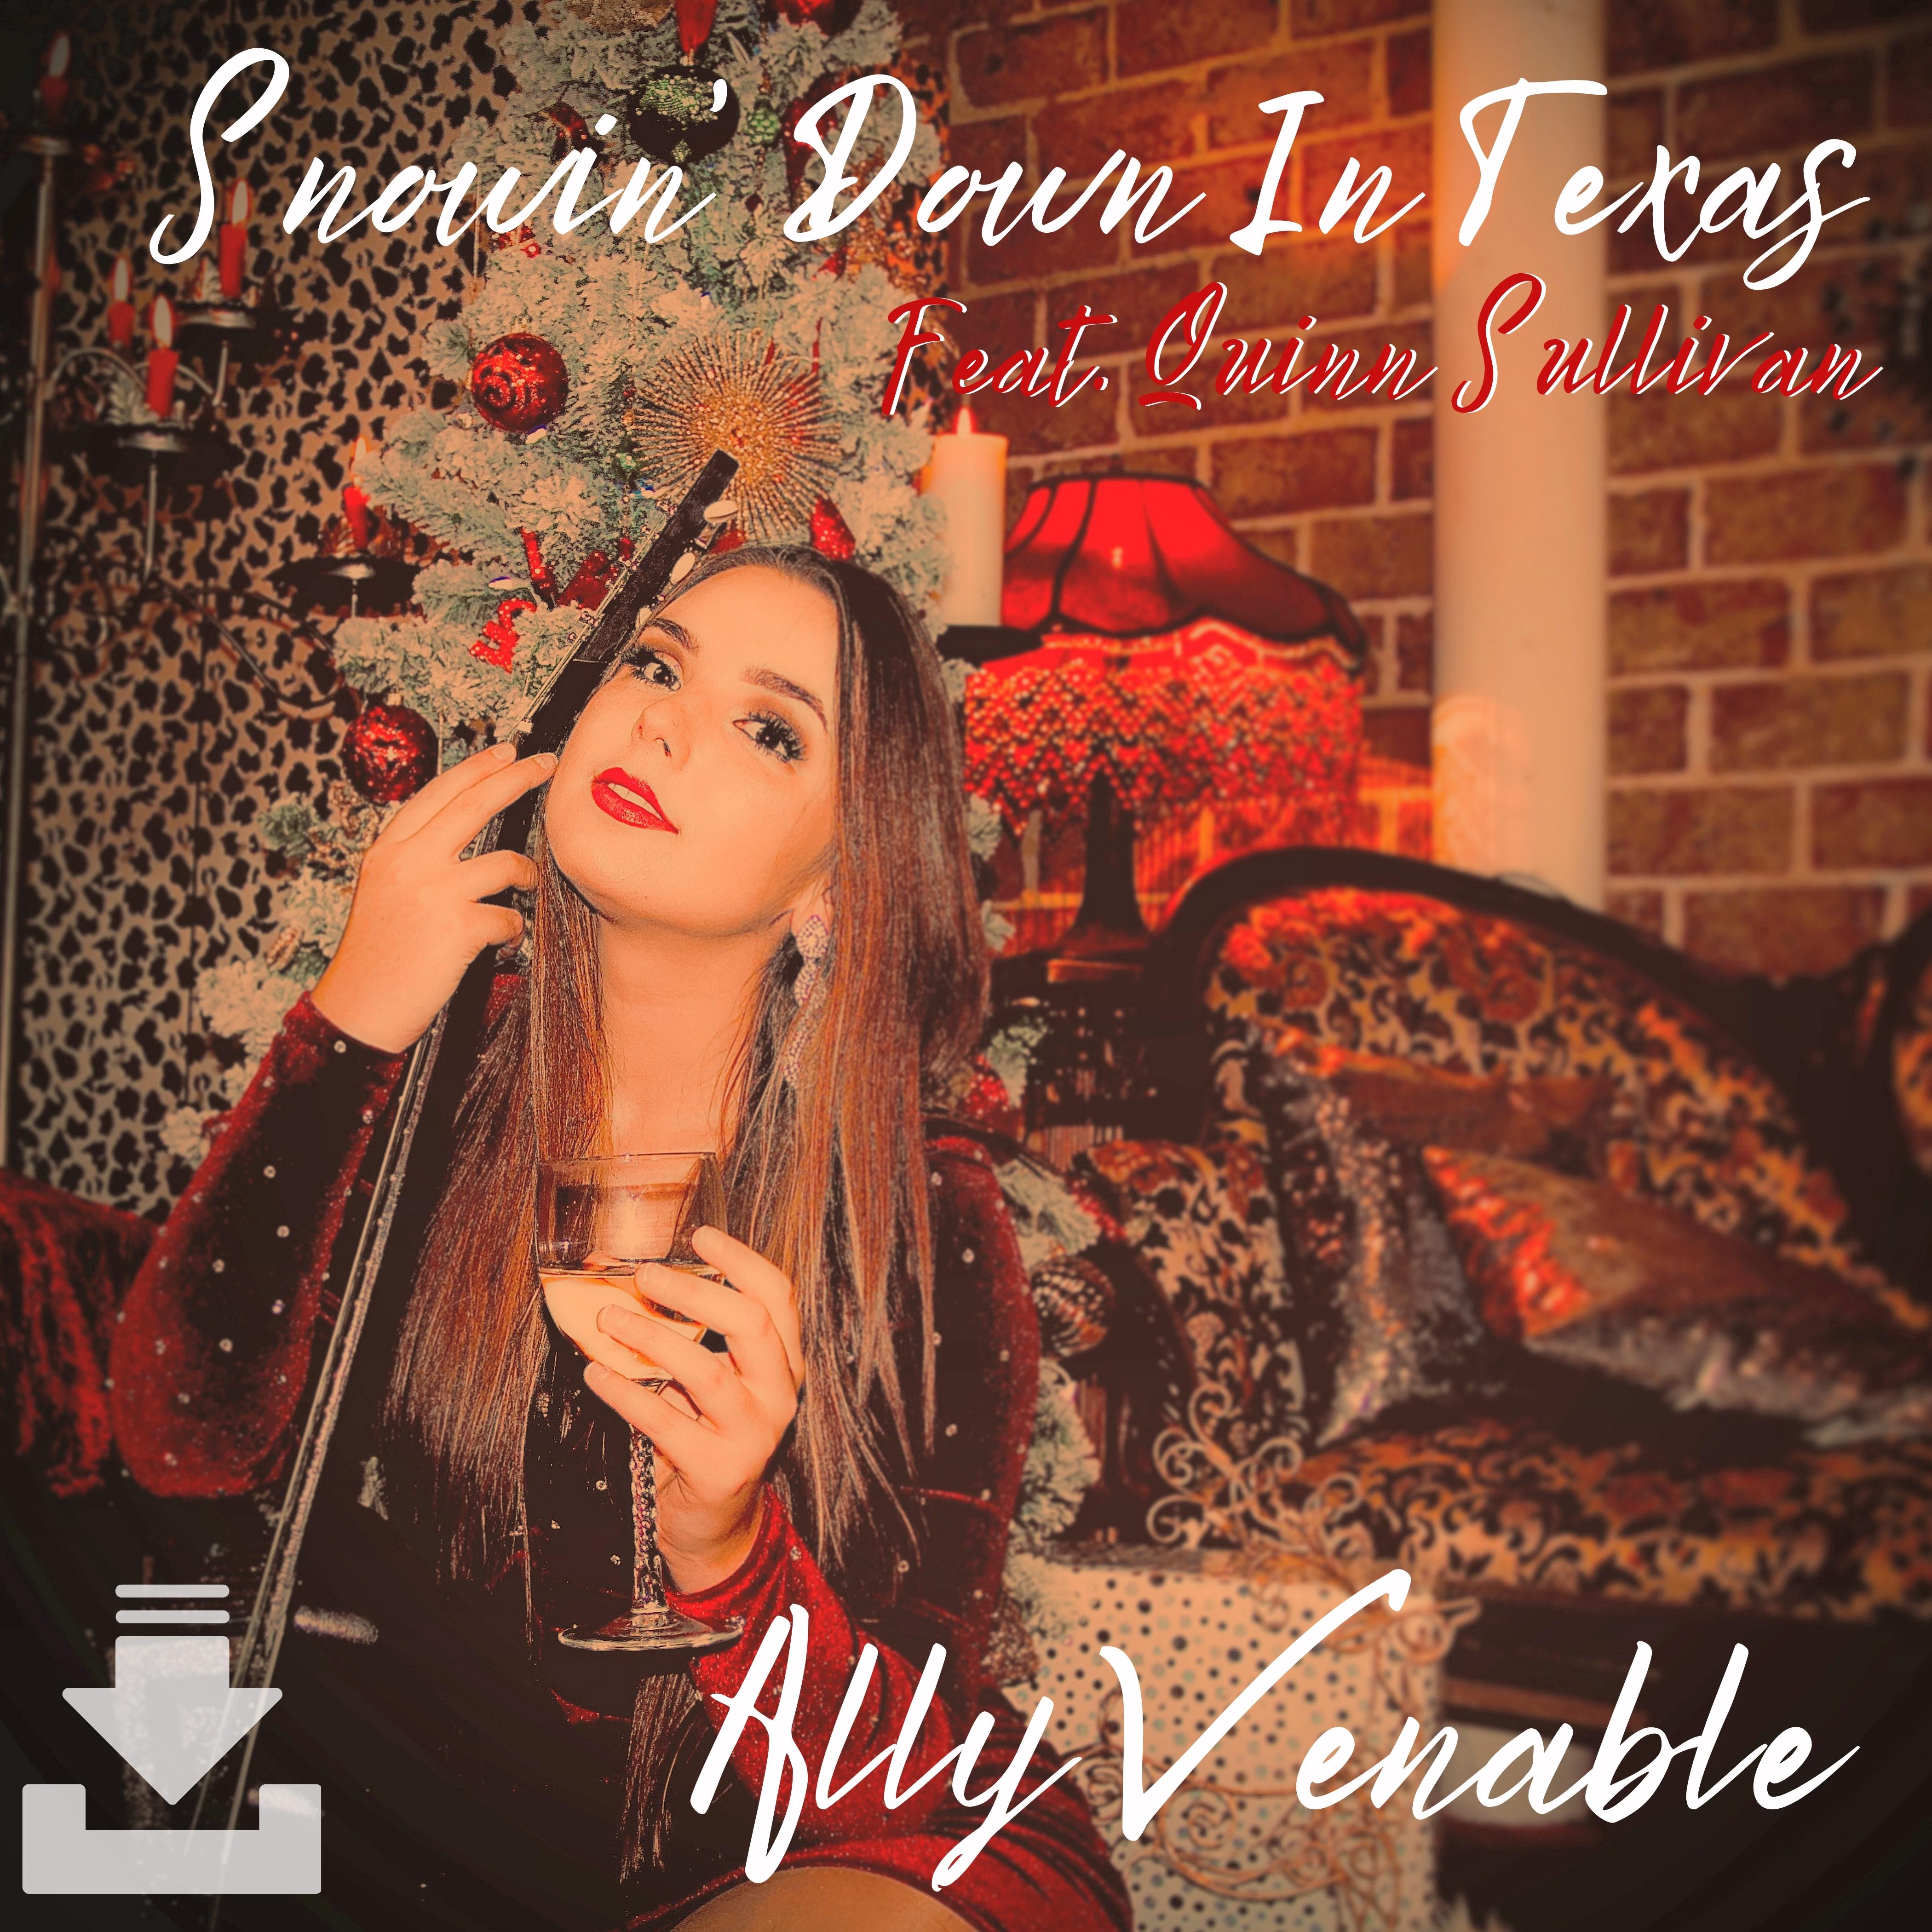 Snowin' Down In Texas (Feat. Quinn Sullivan) - Digital Single